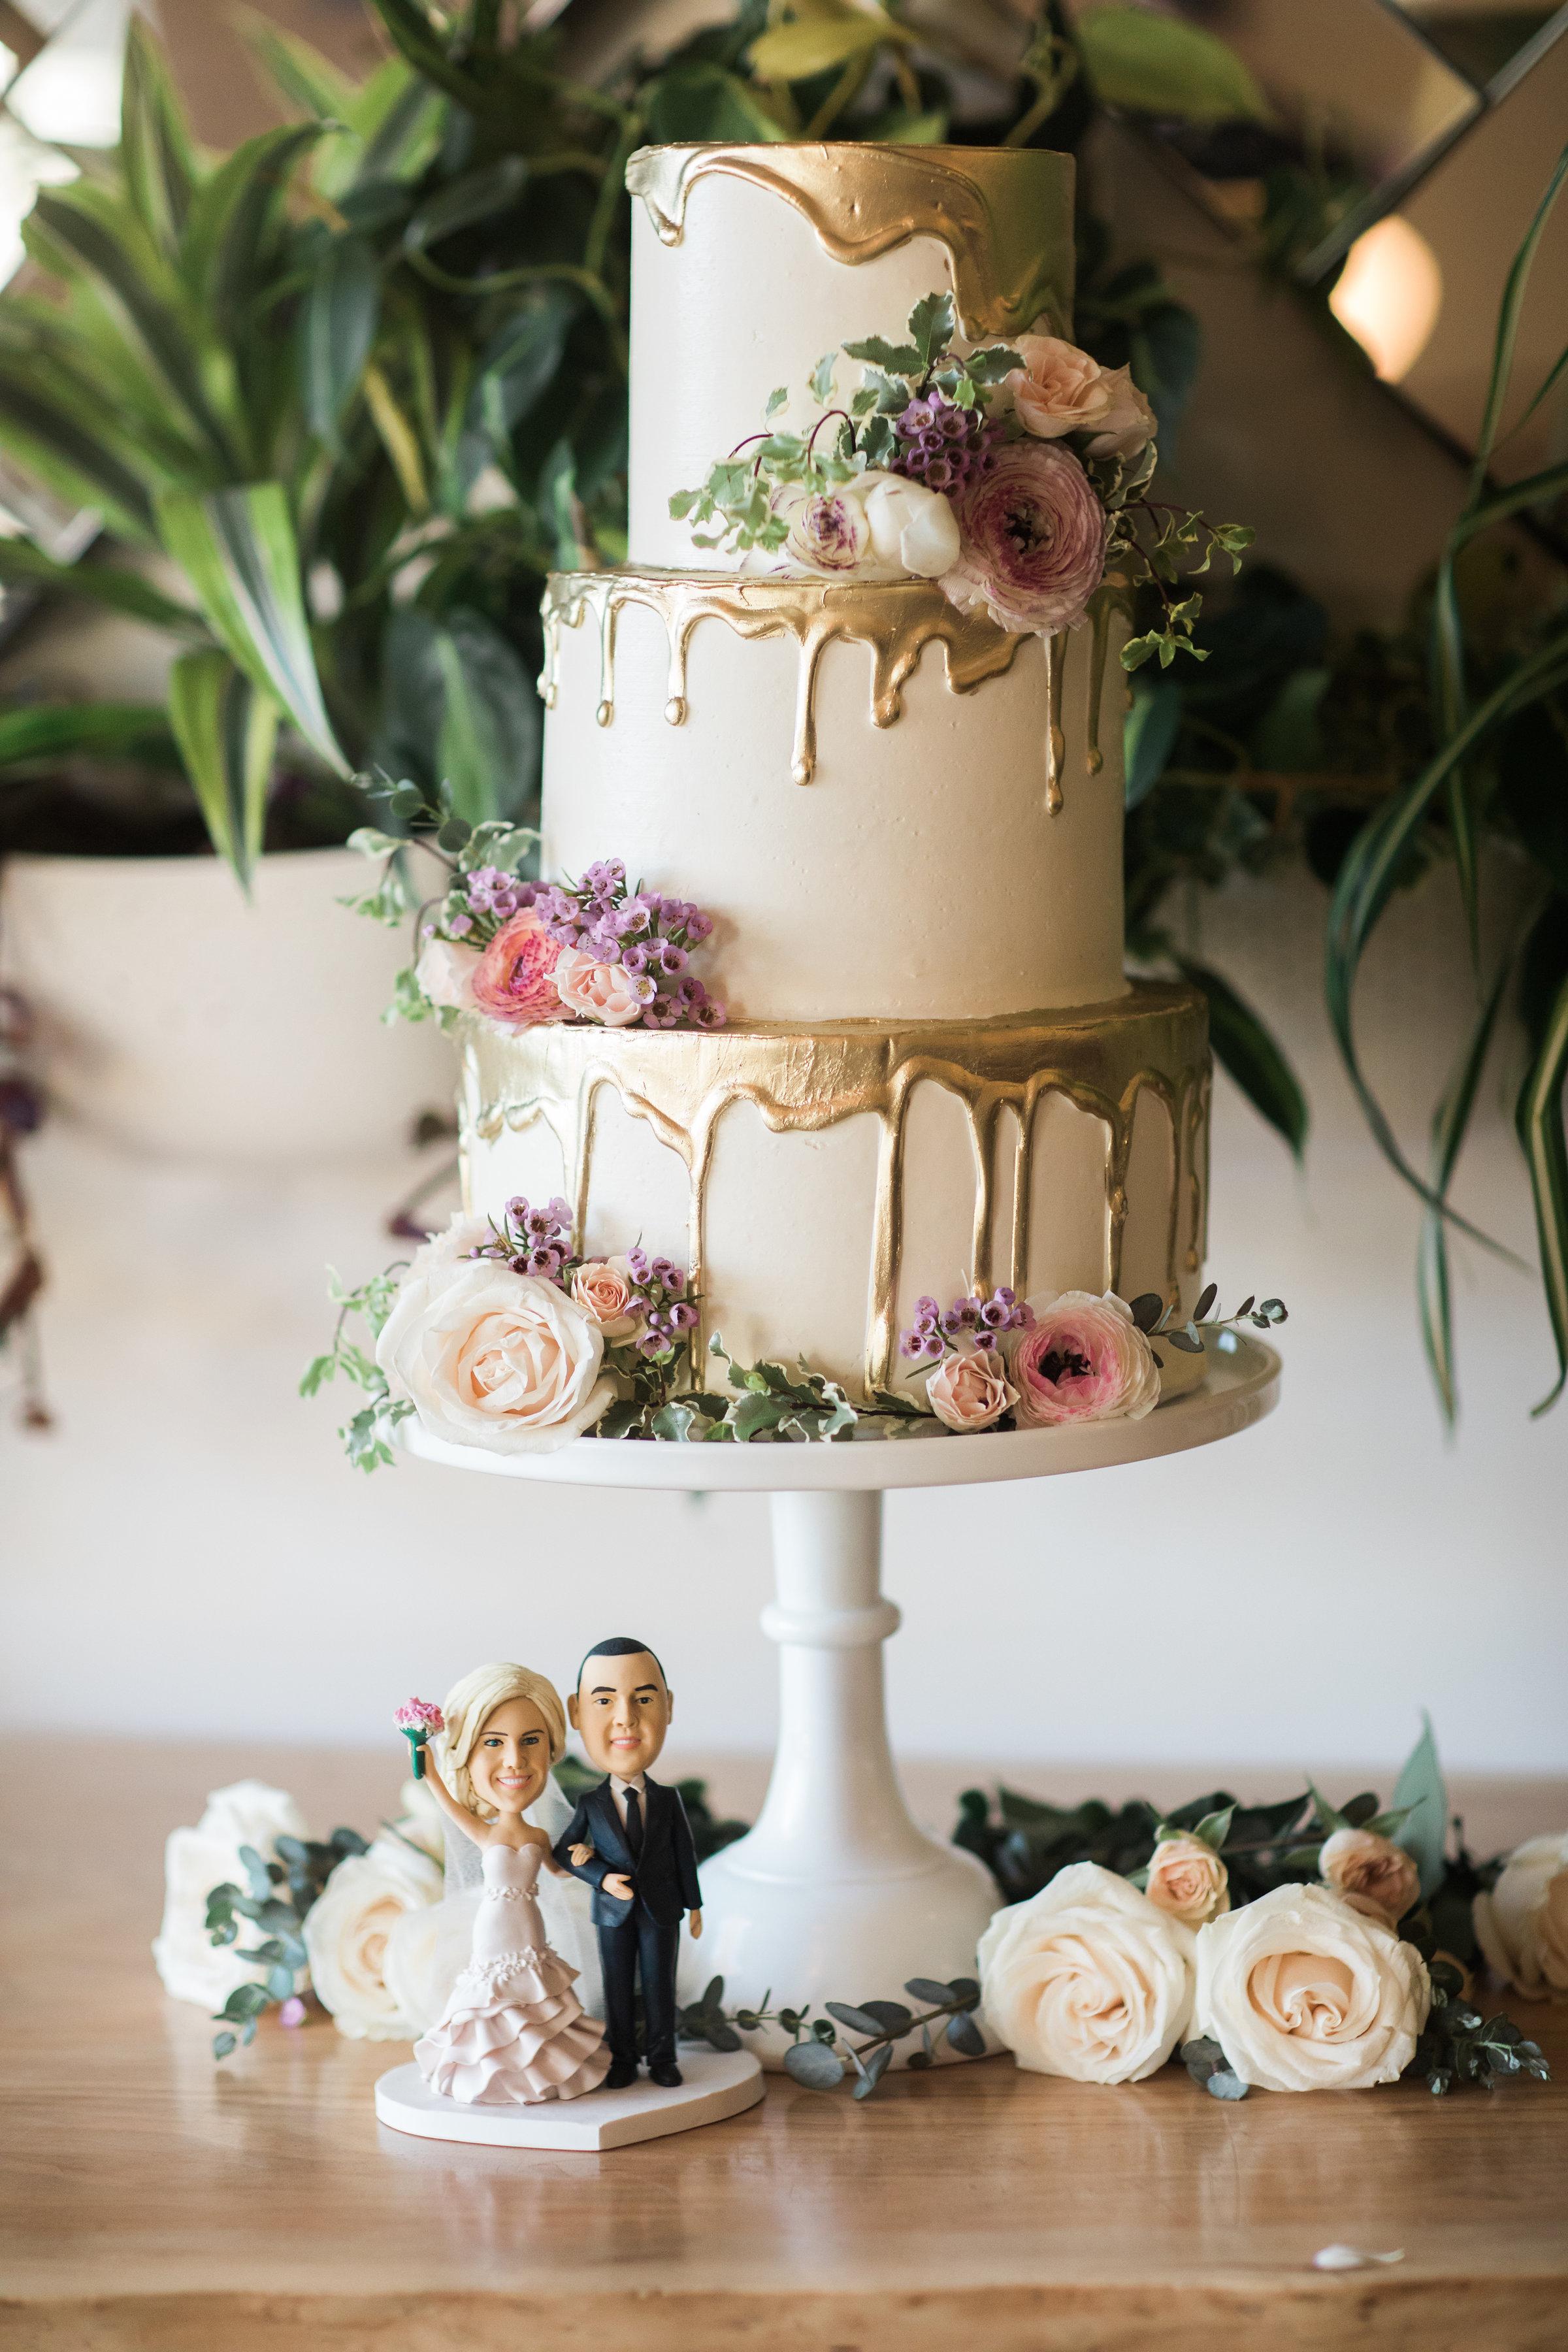 Sarah + David // Photographer:  Casey Brodley , Cake:  Nicole Bakes Cakes ,EFW Floral Design